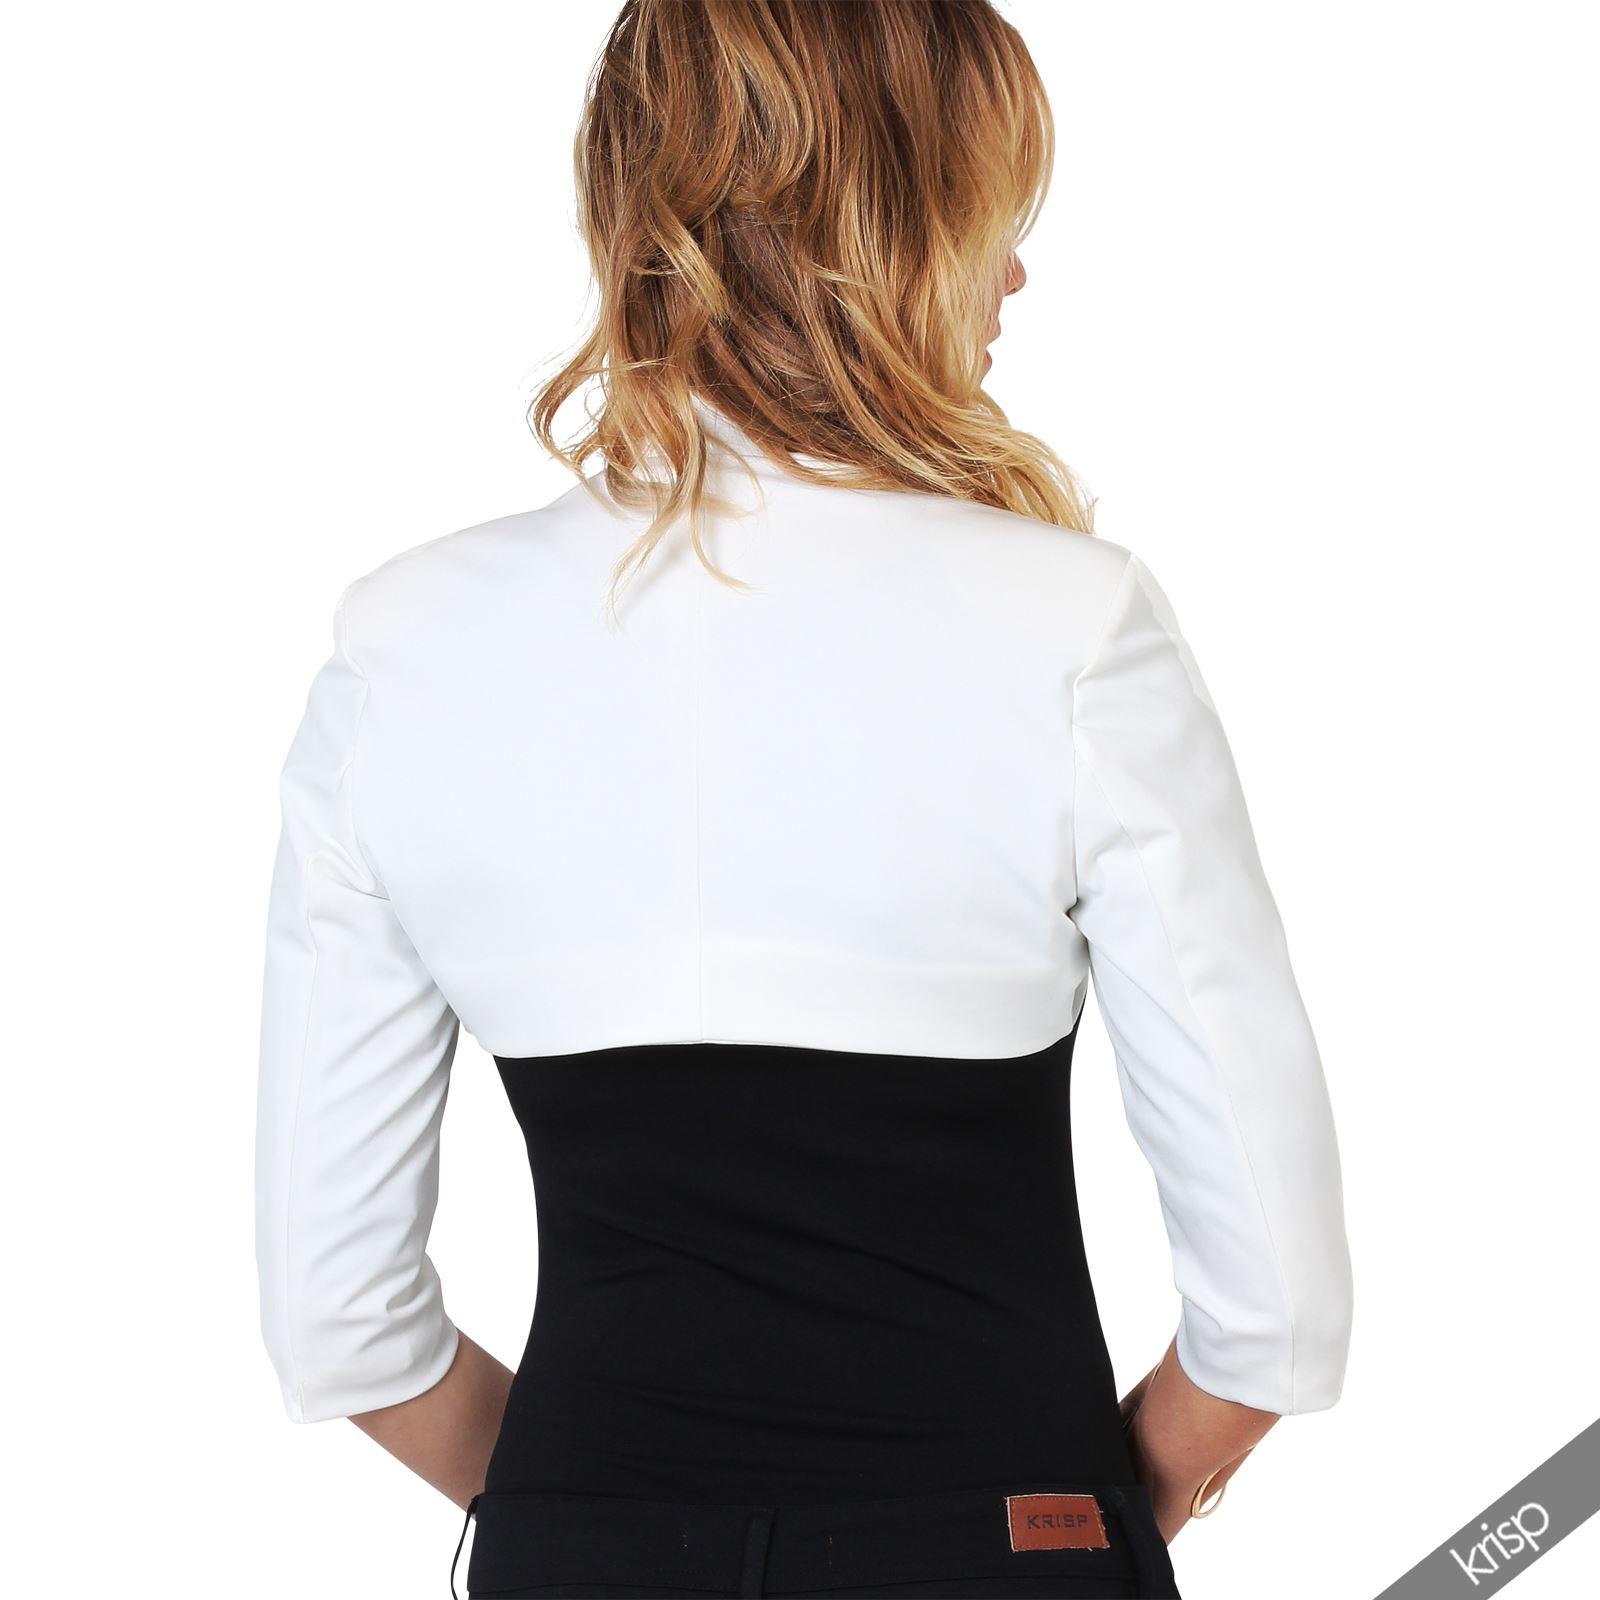 Womens-Tailored-Bolero-Shrug-Cropped-Top-Short-Sleeve-Party-Blazer-Jacket-Coat thumbnail 24